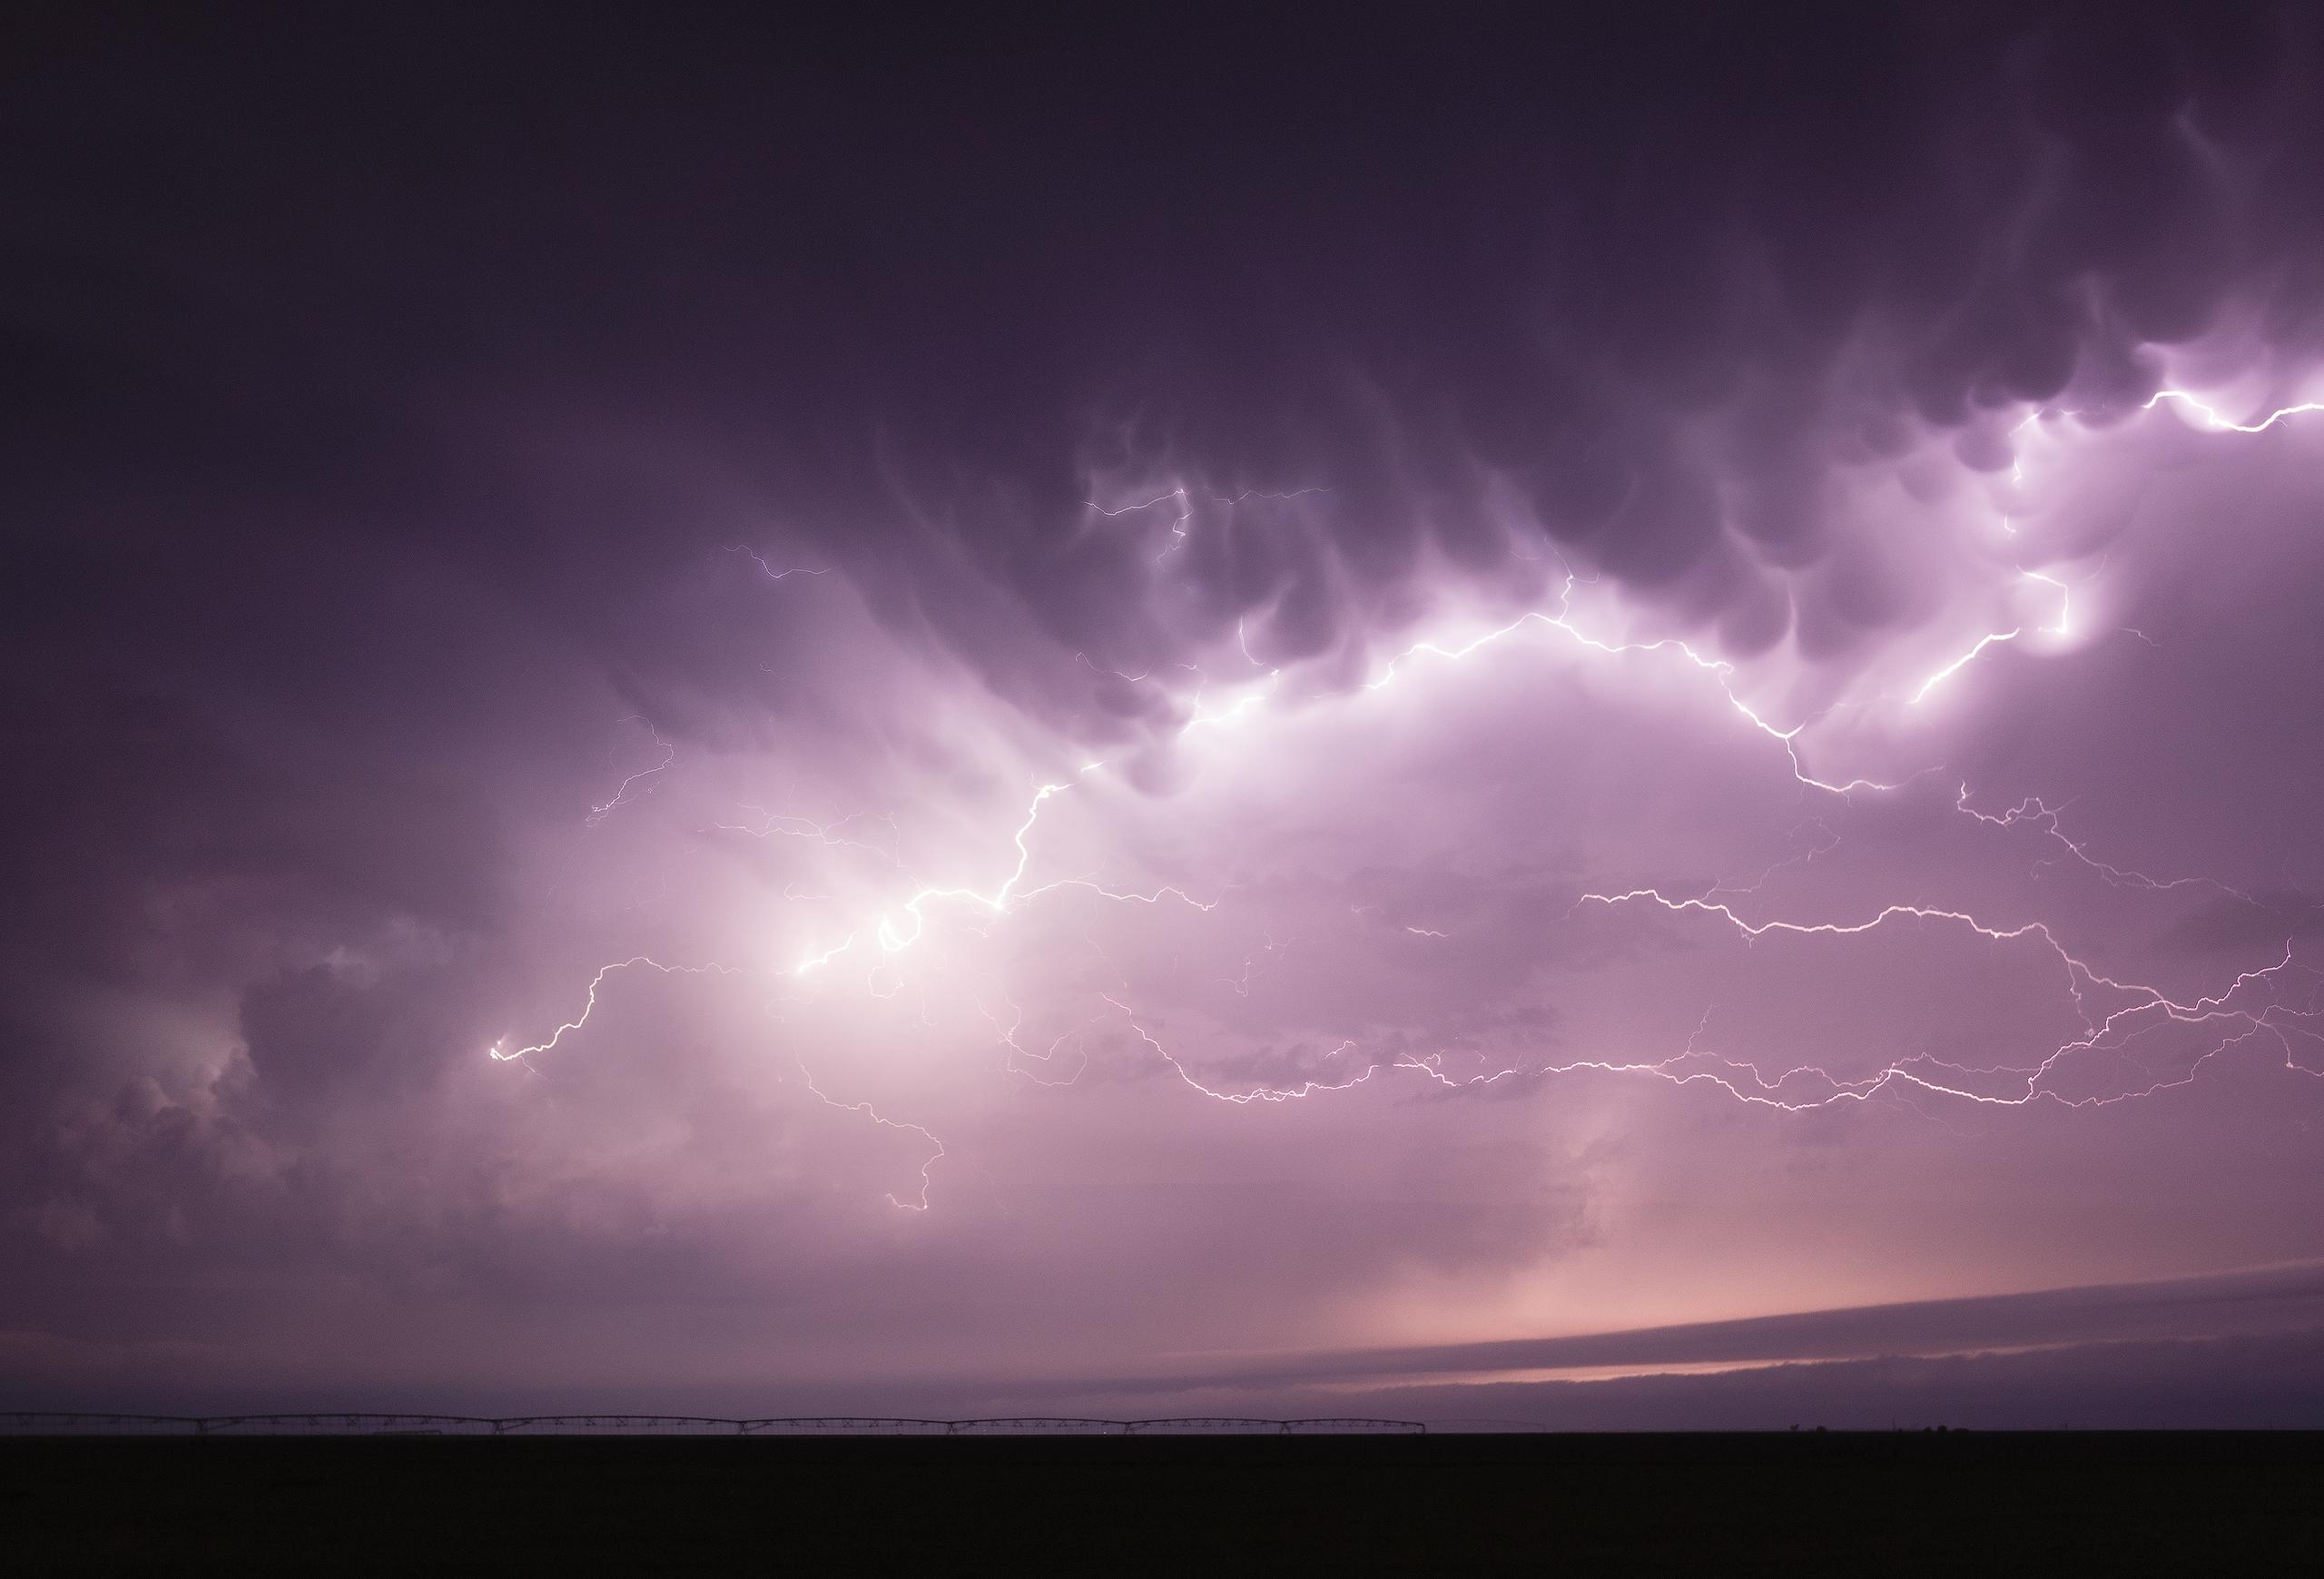 4-15-16-Dumas-Texas-lightning-V2-3k.jpg